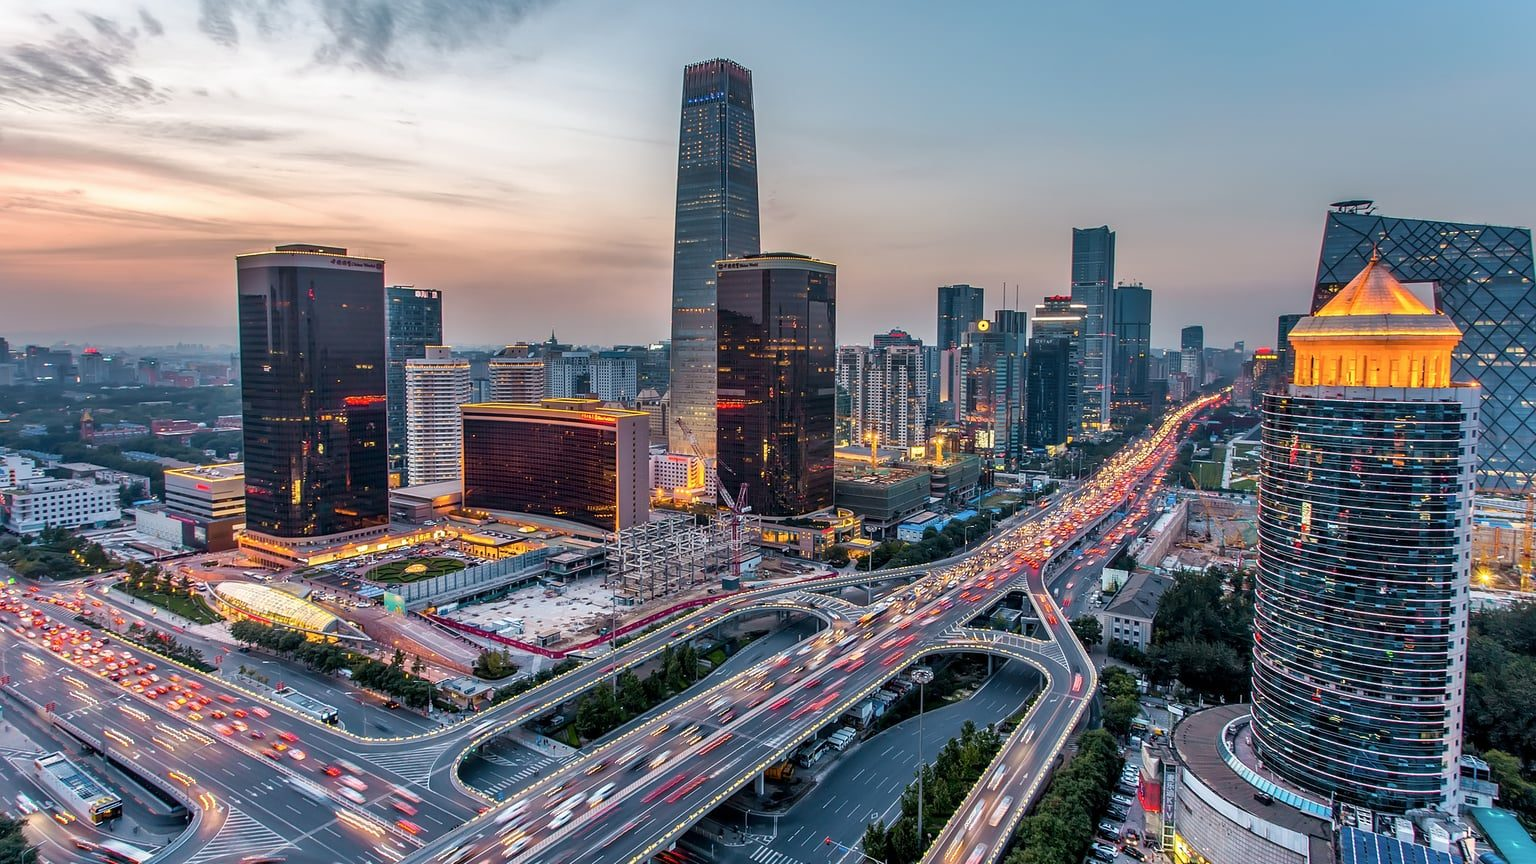 The China World Trade Center in Beijing, China